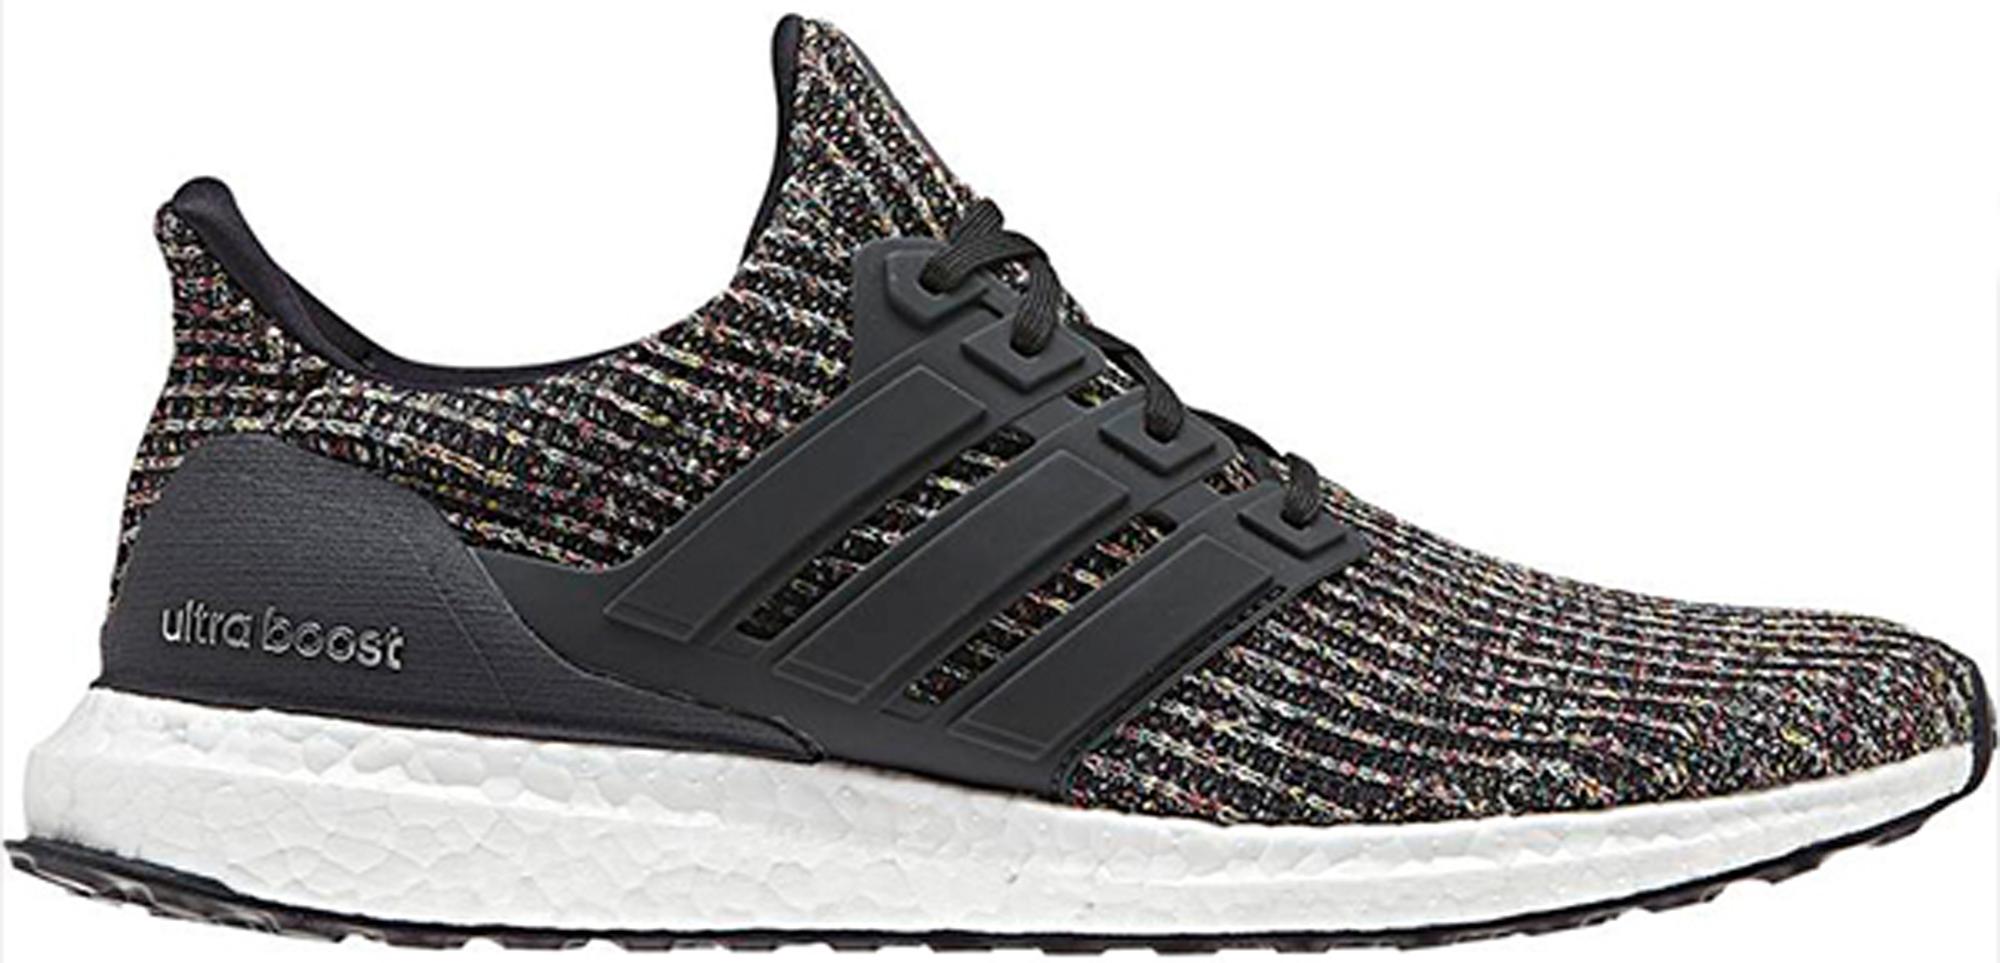 adidas Ultra Boost 4.0 Black Multi-Color